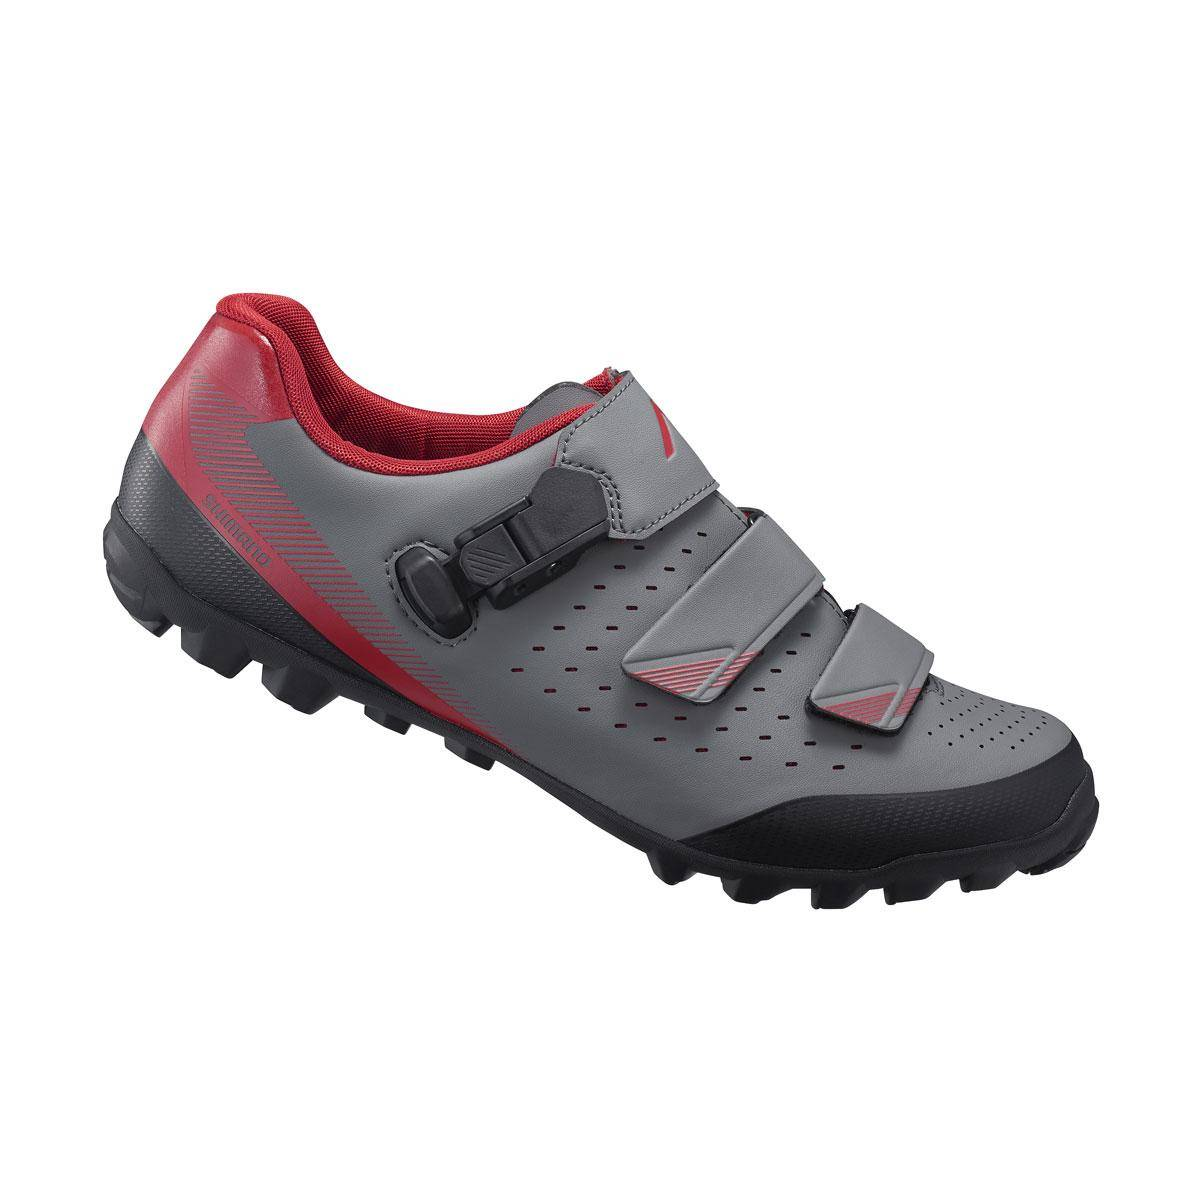 Shimano MTB obuv SH-ME301MG, šedá, 43